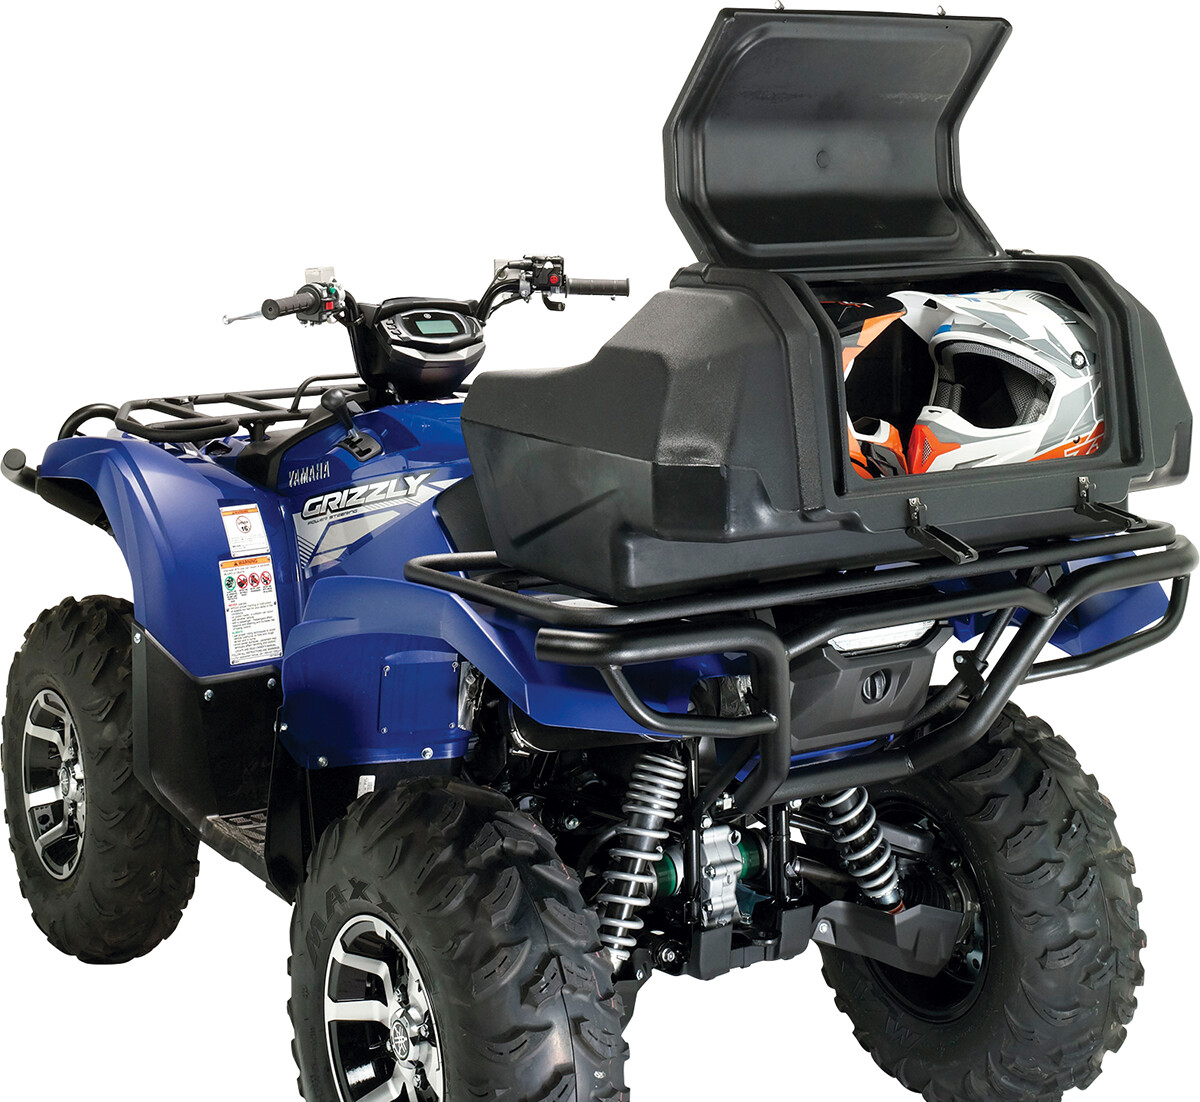 Moose ATV Rear Seat w/Helmet Storage, CFMOTO, Polaris Universal Trunk Box (3505-0206)